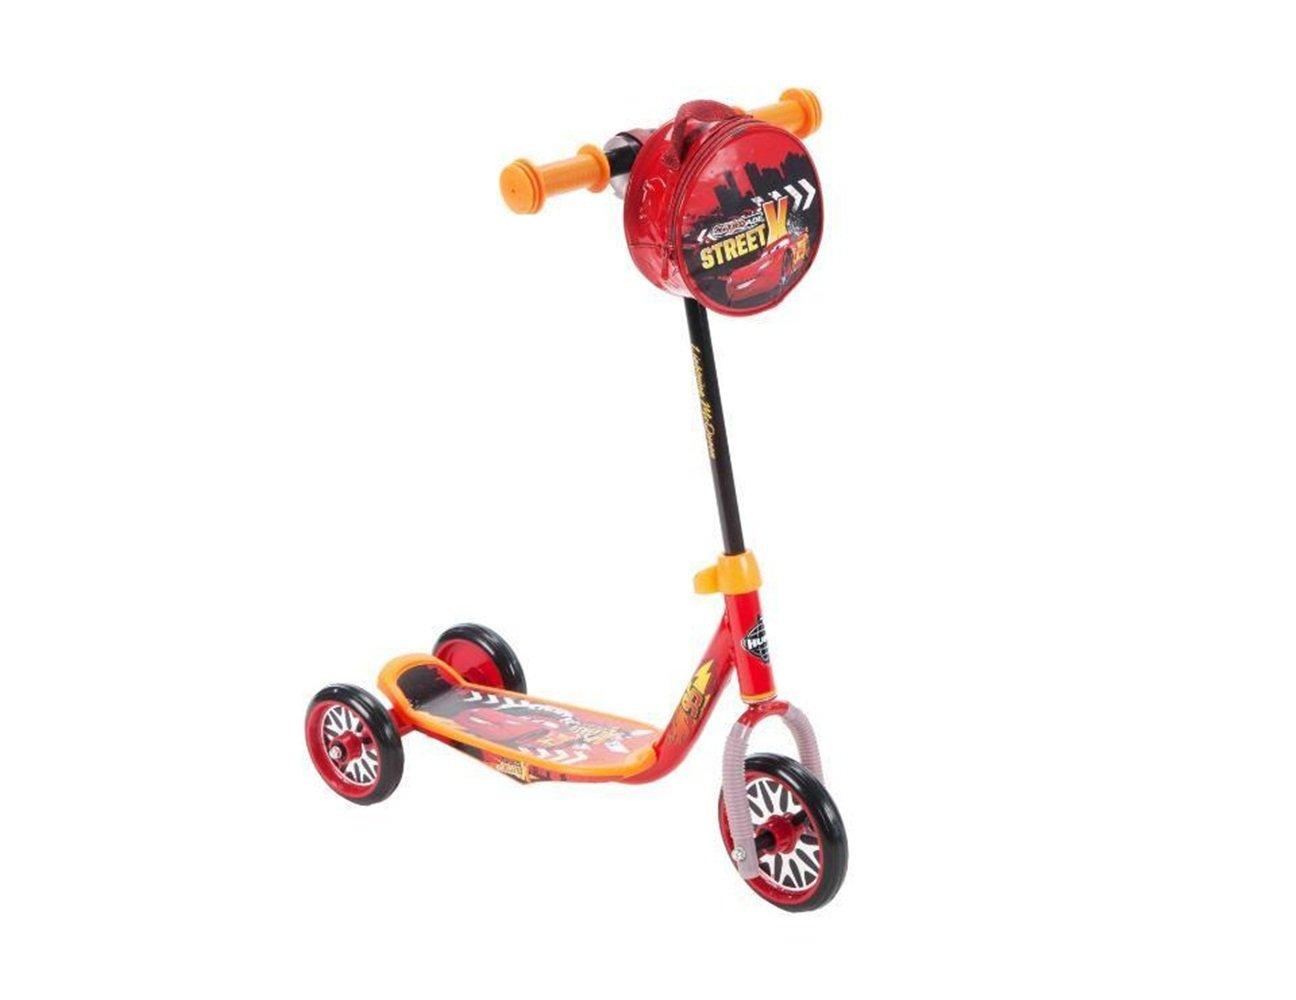 3 Wheel Scooter Huffy Cars with Handlebar Bag